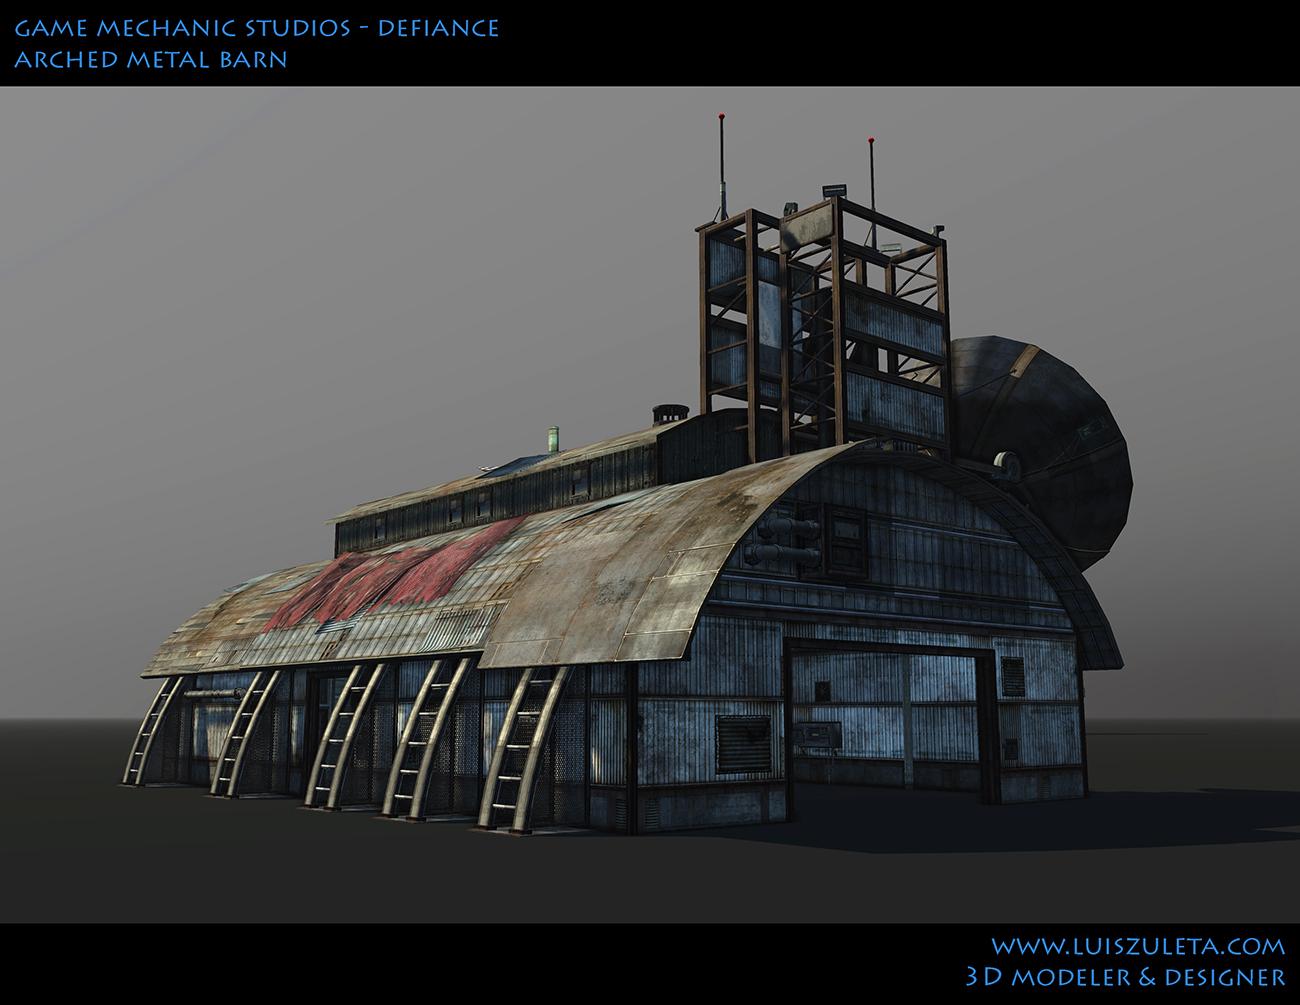 Arched Metal Barn 2.jpg